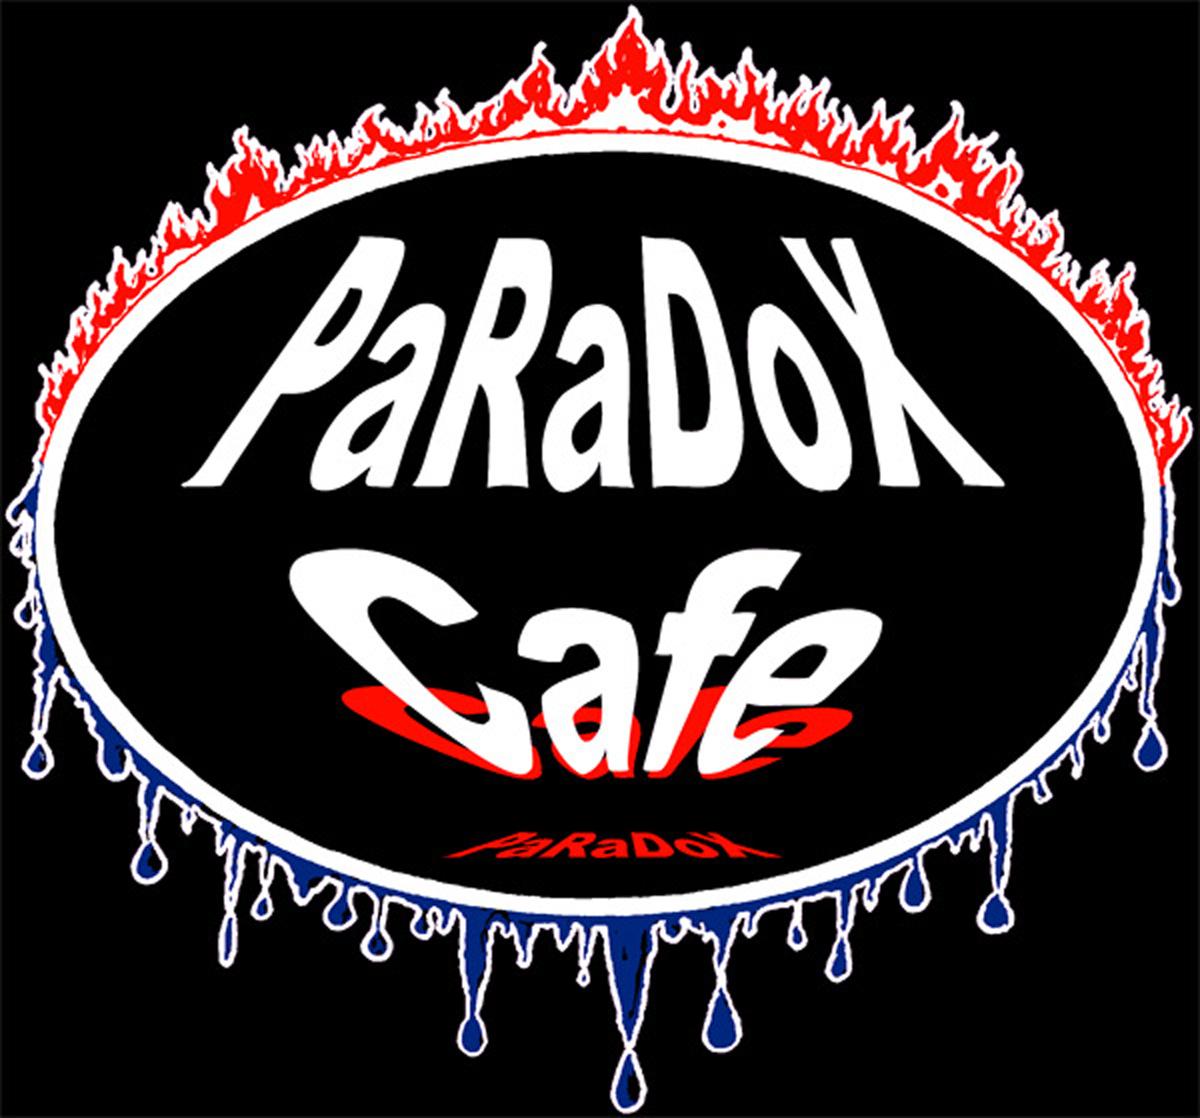 Paradox Cafe Logo